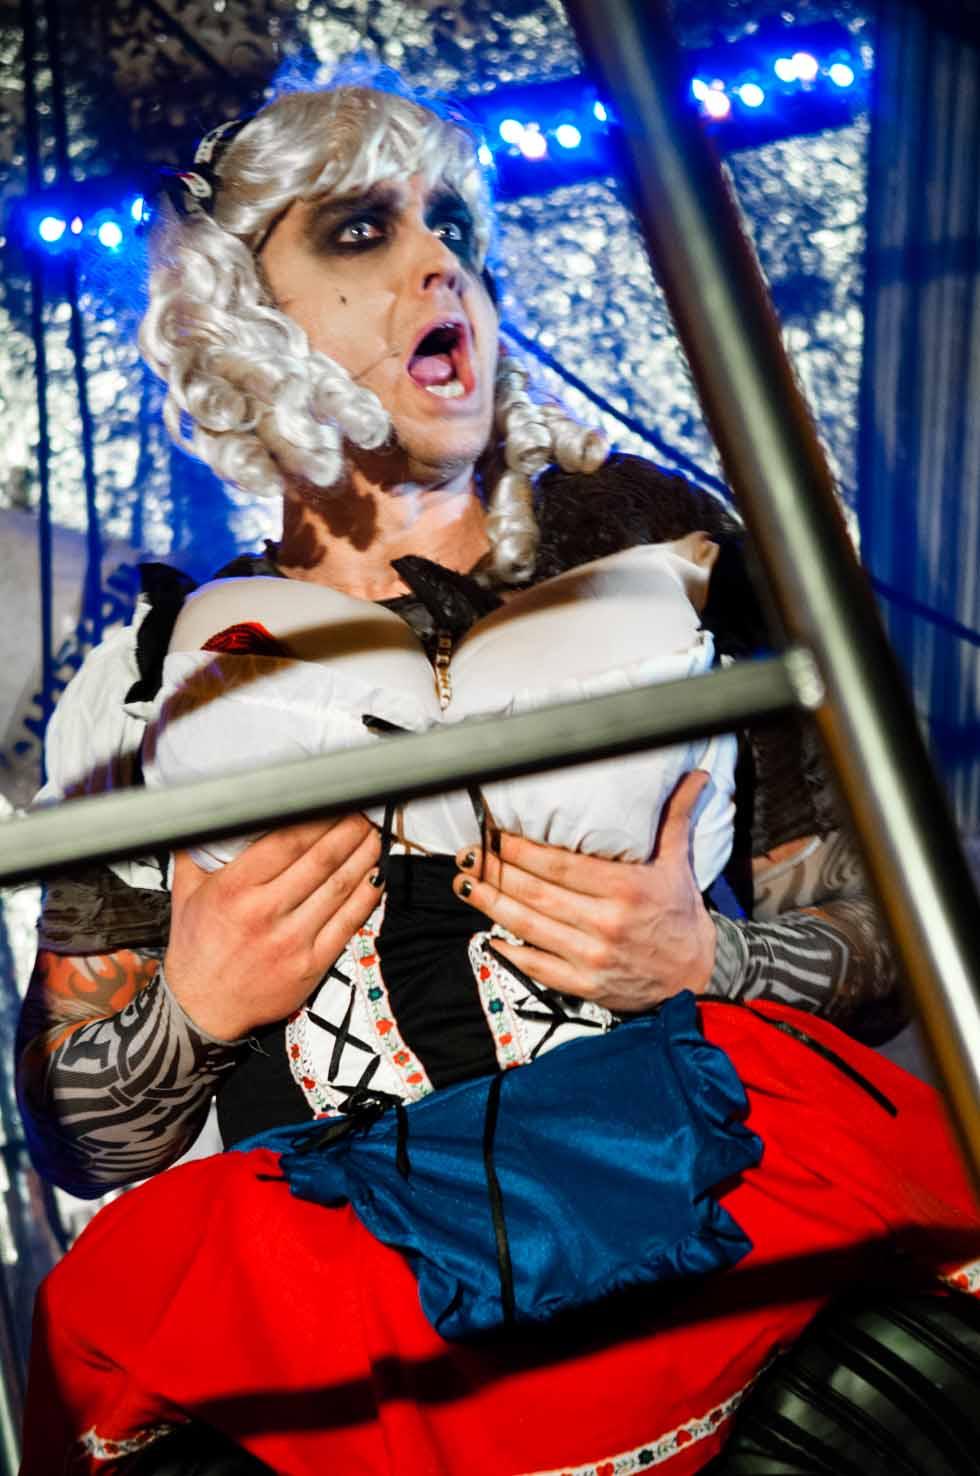 zum-schneider-nyc-2012-karneval-apocalyptika-3712.jpg